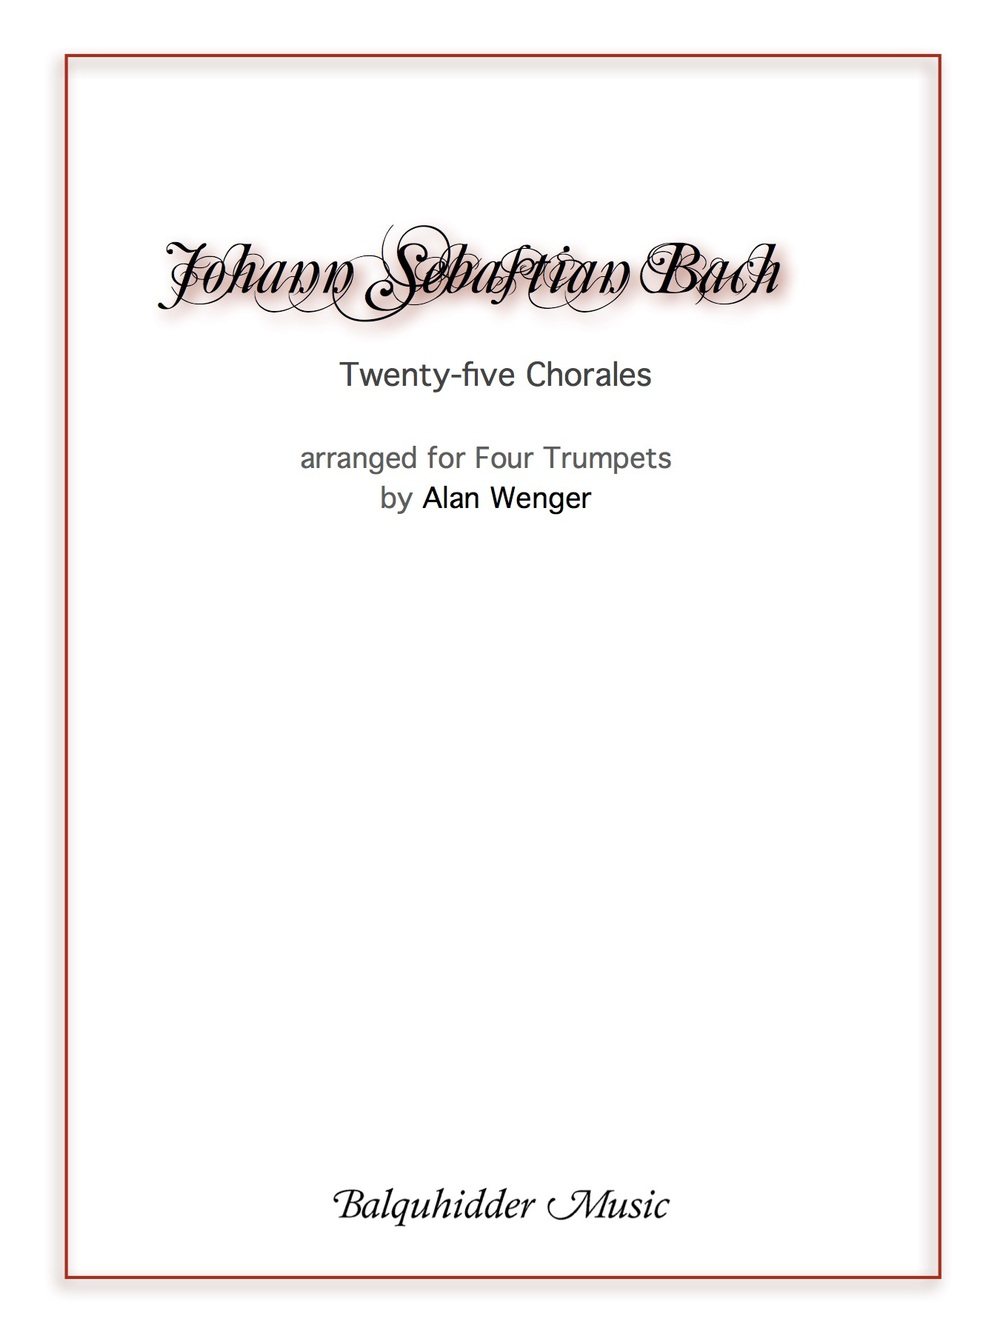 25 Chorales For Four Trumpets Js Bach Balquhidder Music